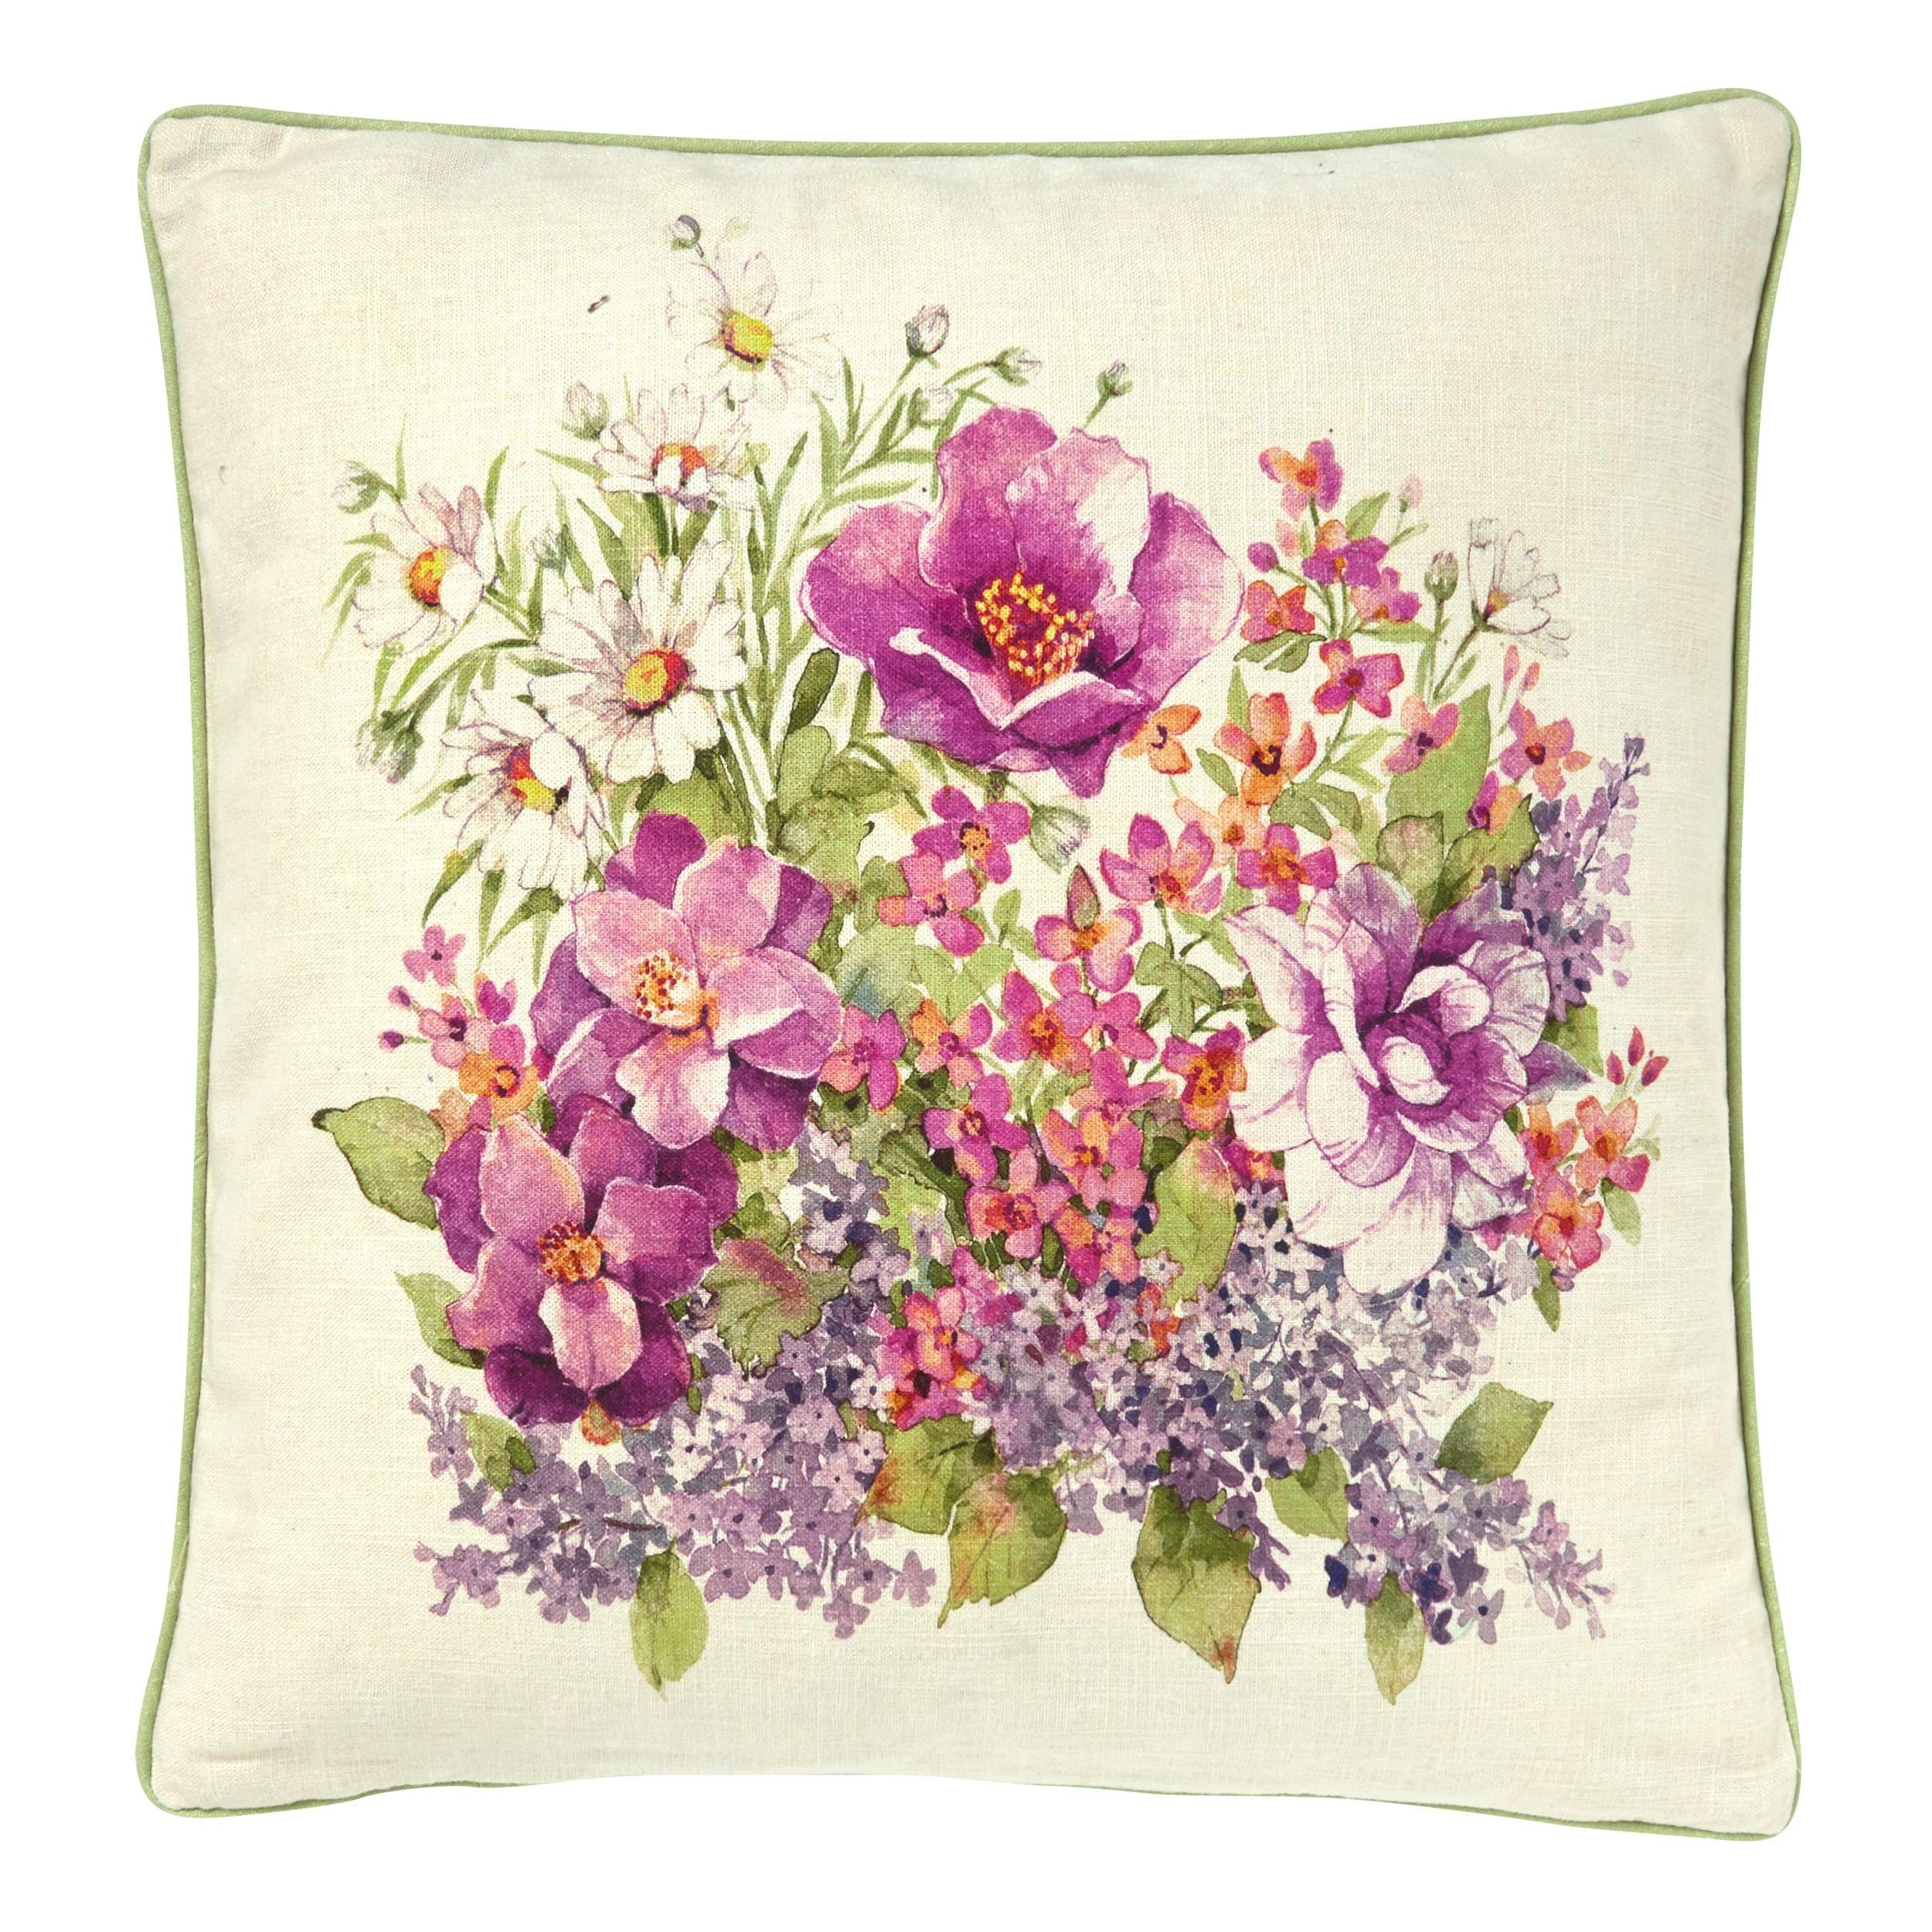 Vintage//Shabby Chic Laura Ashley Peony Blossom Amethyst fabric Cushion Cover